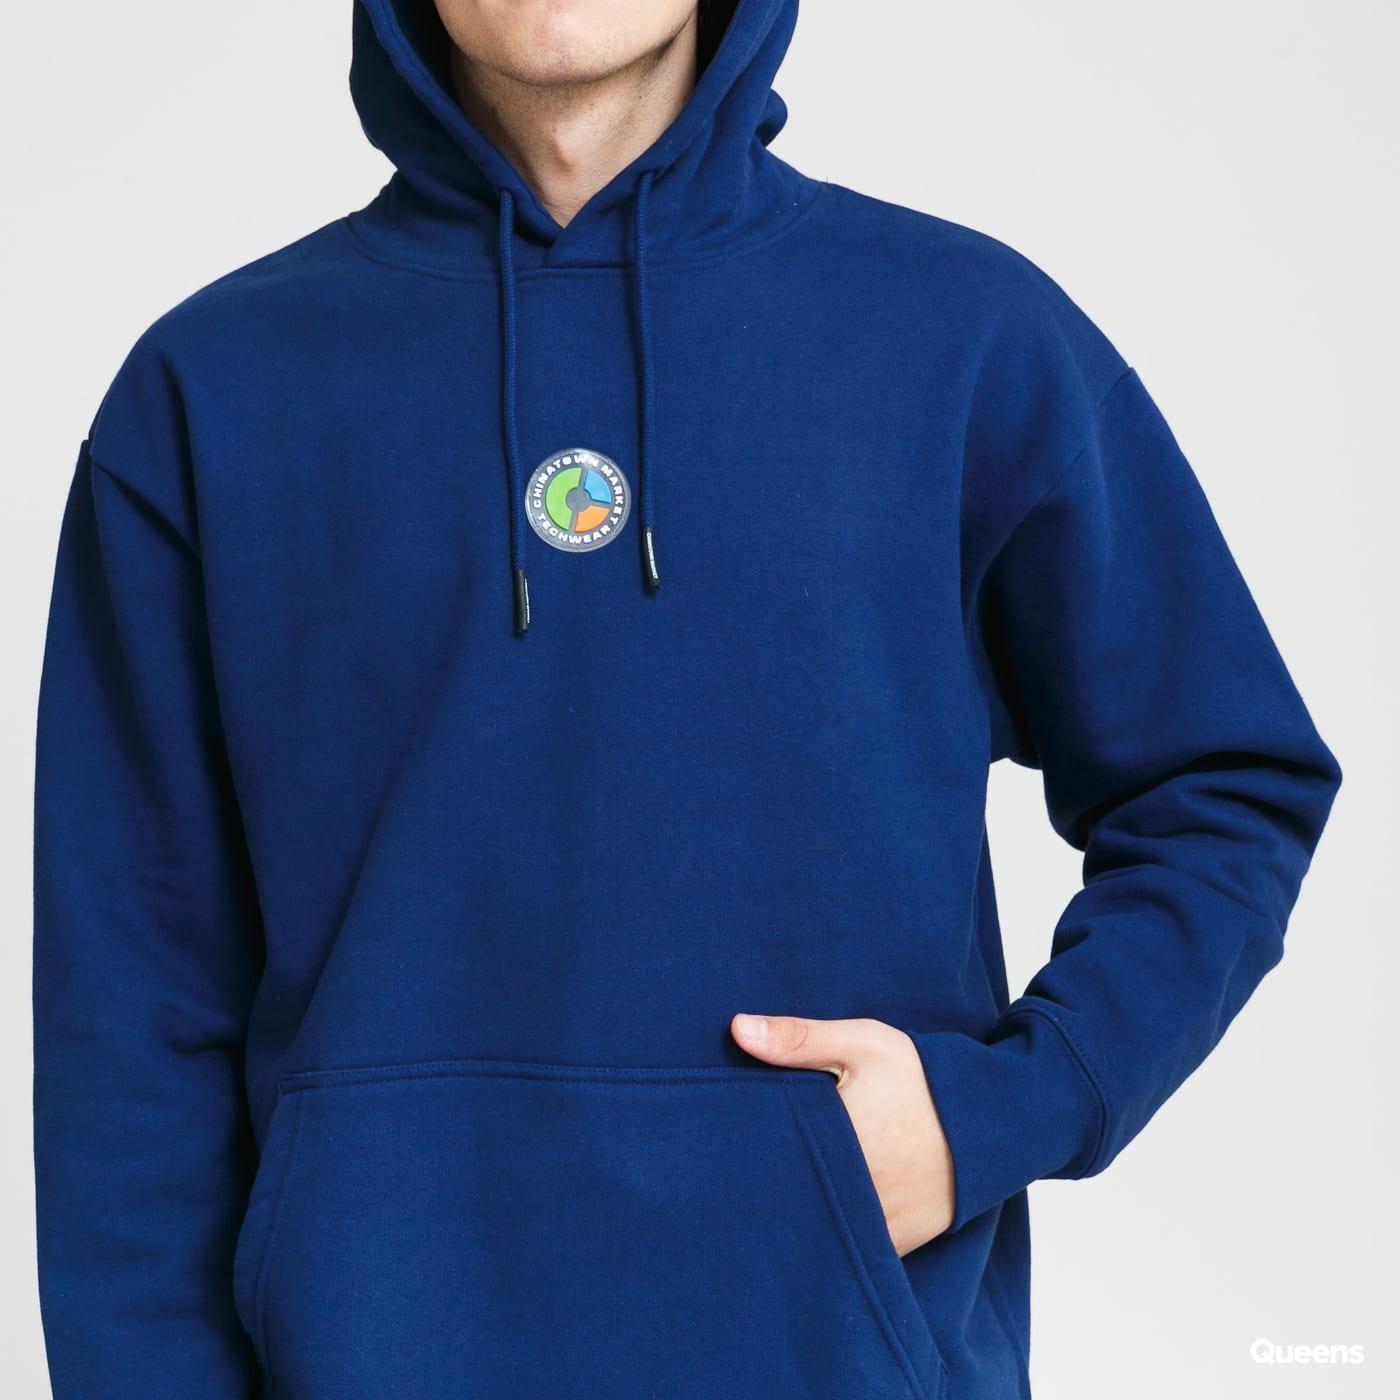 Chinatown Market Tech Wear Hoodie blue / turquoise